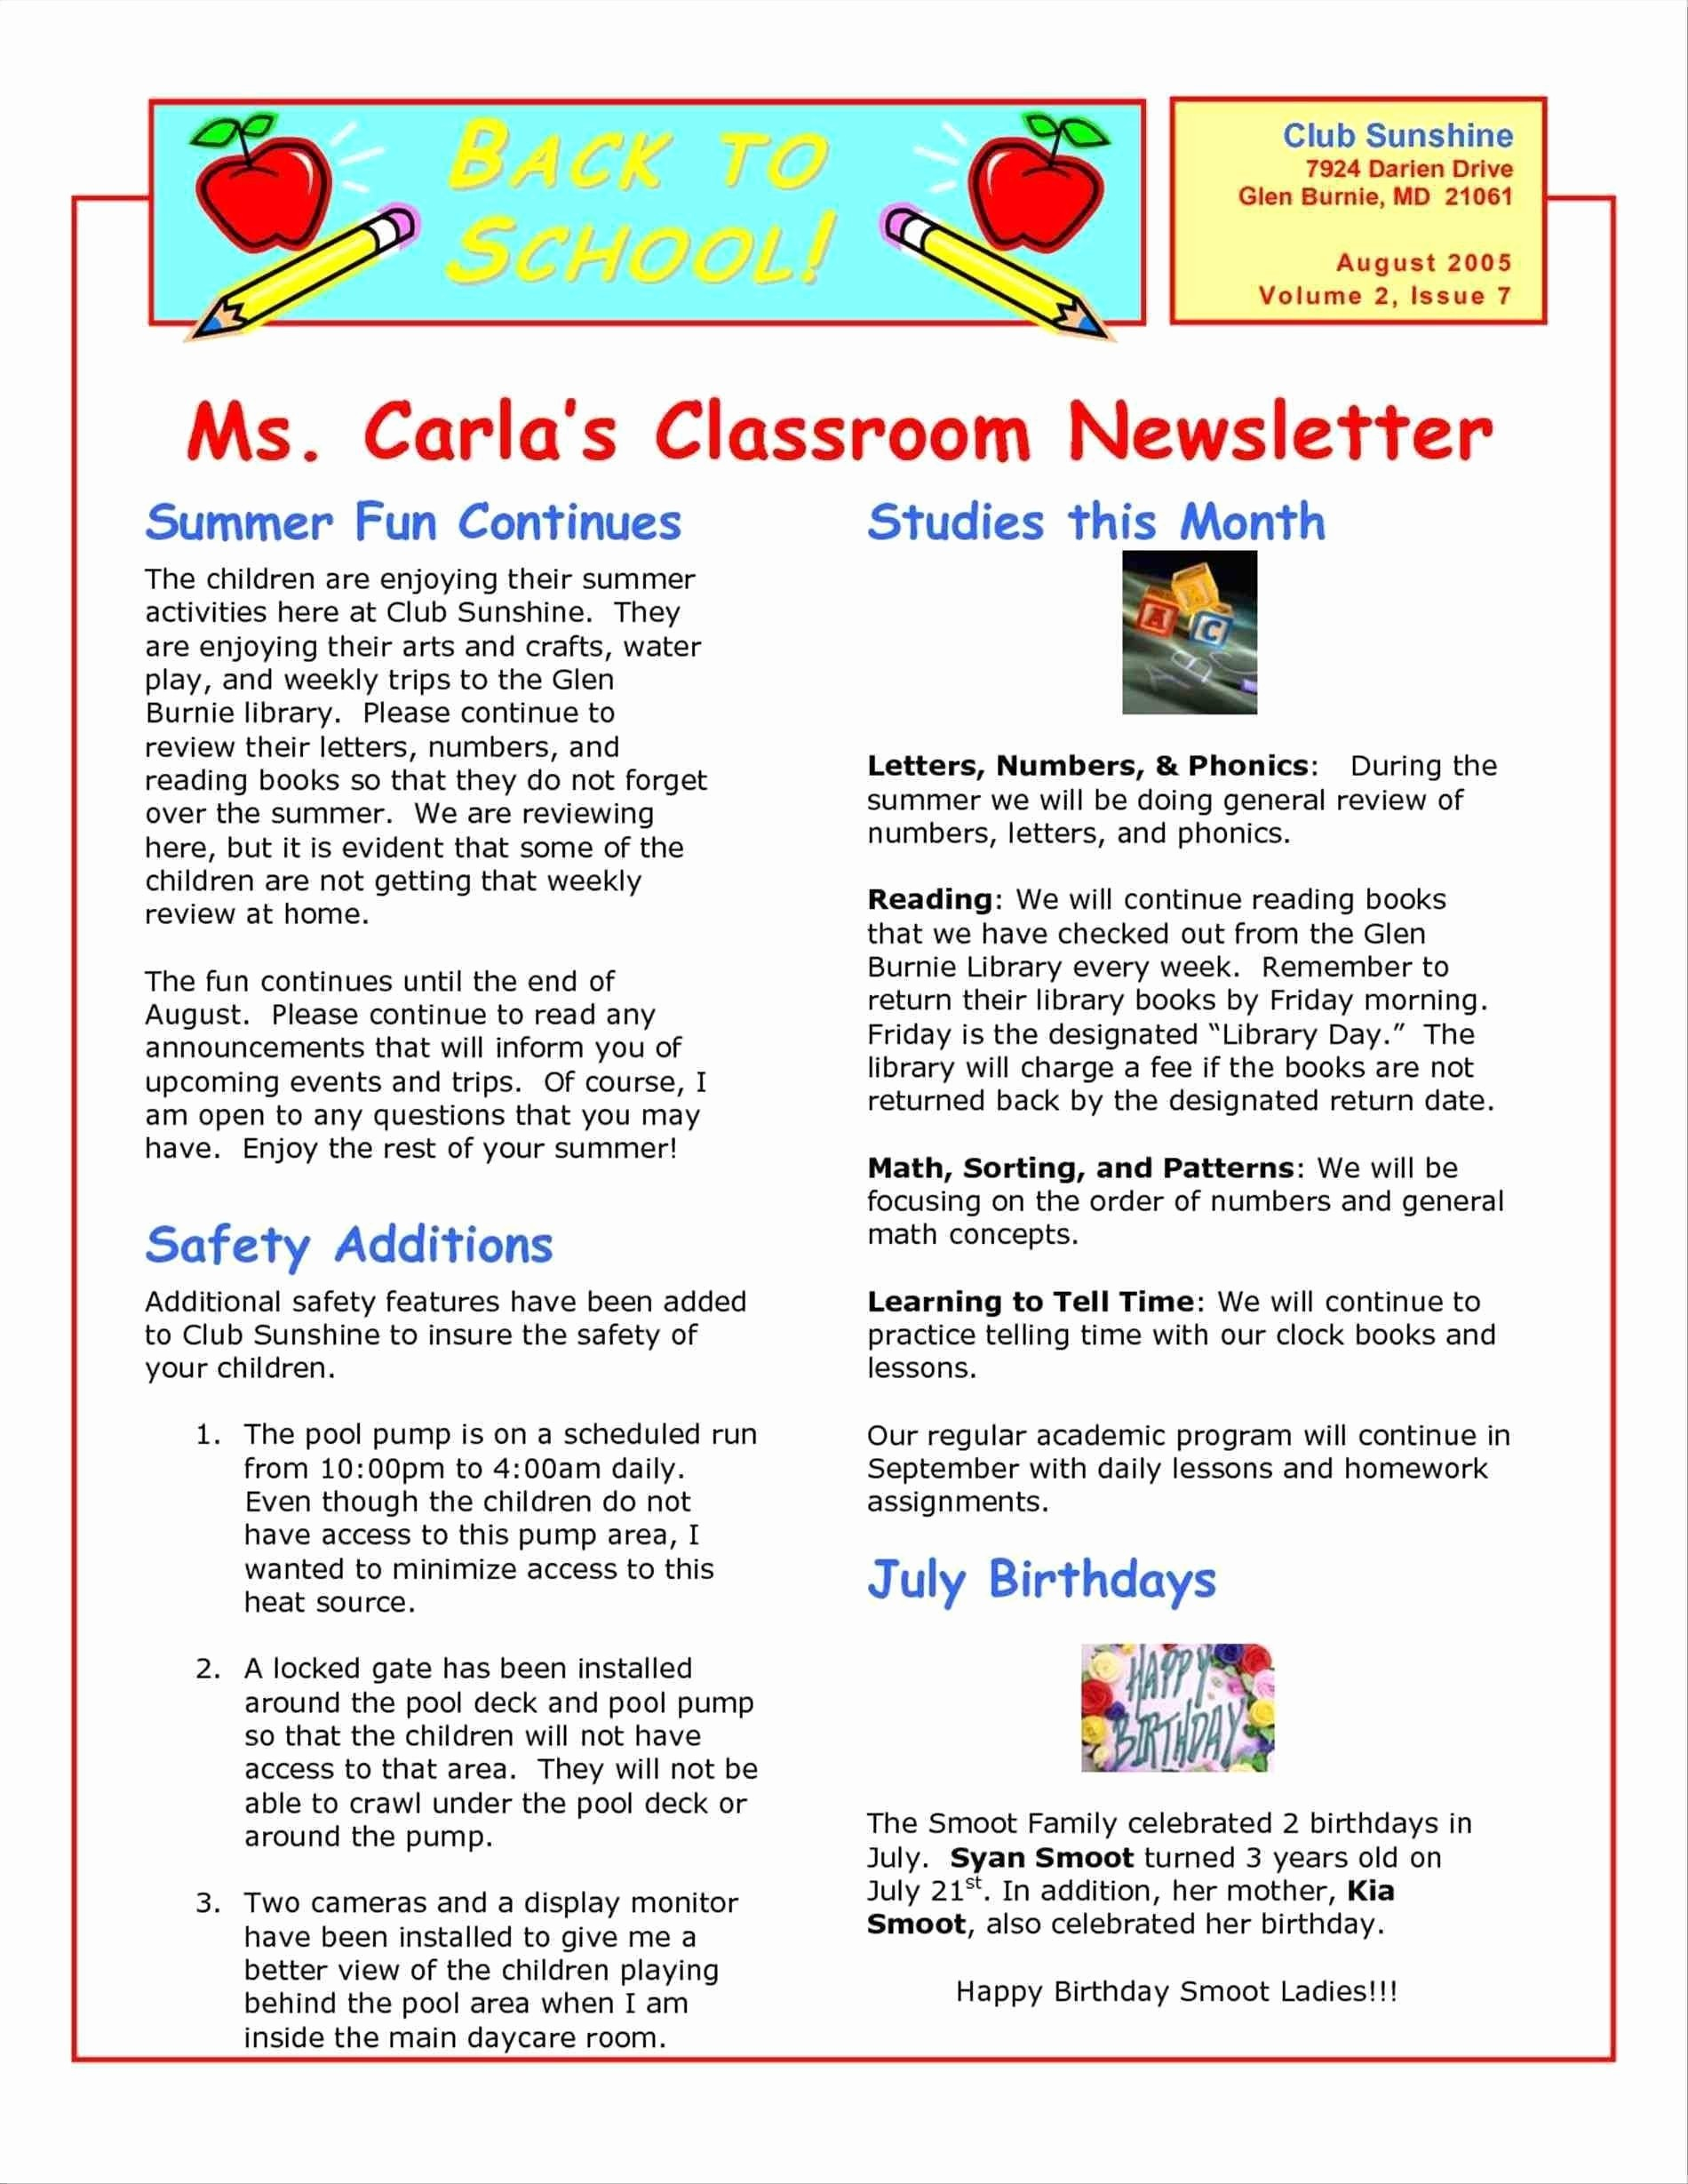 Free Teacher Newsletter Templates Word Fresh Valid Sports Club Newsletter Template Word